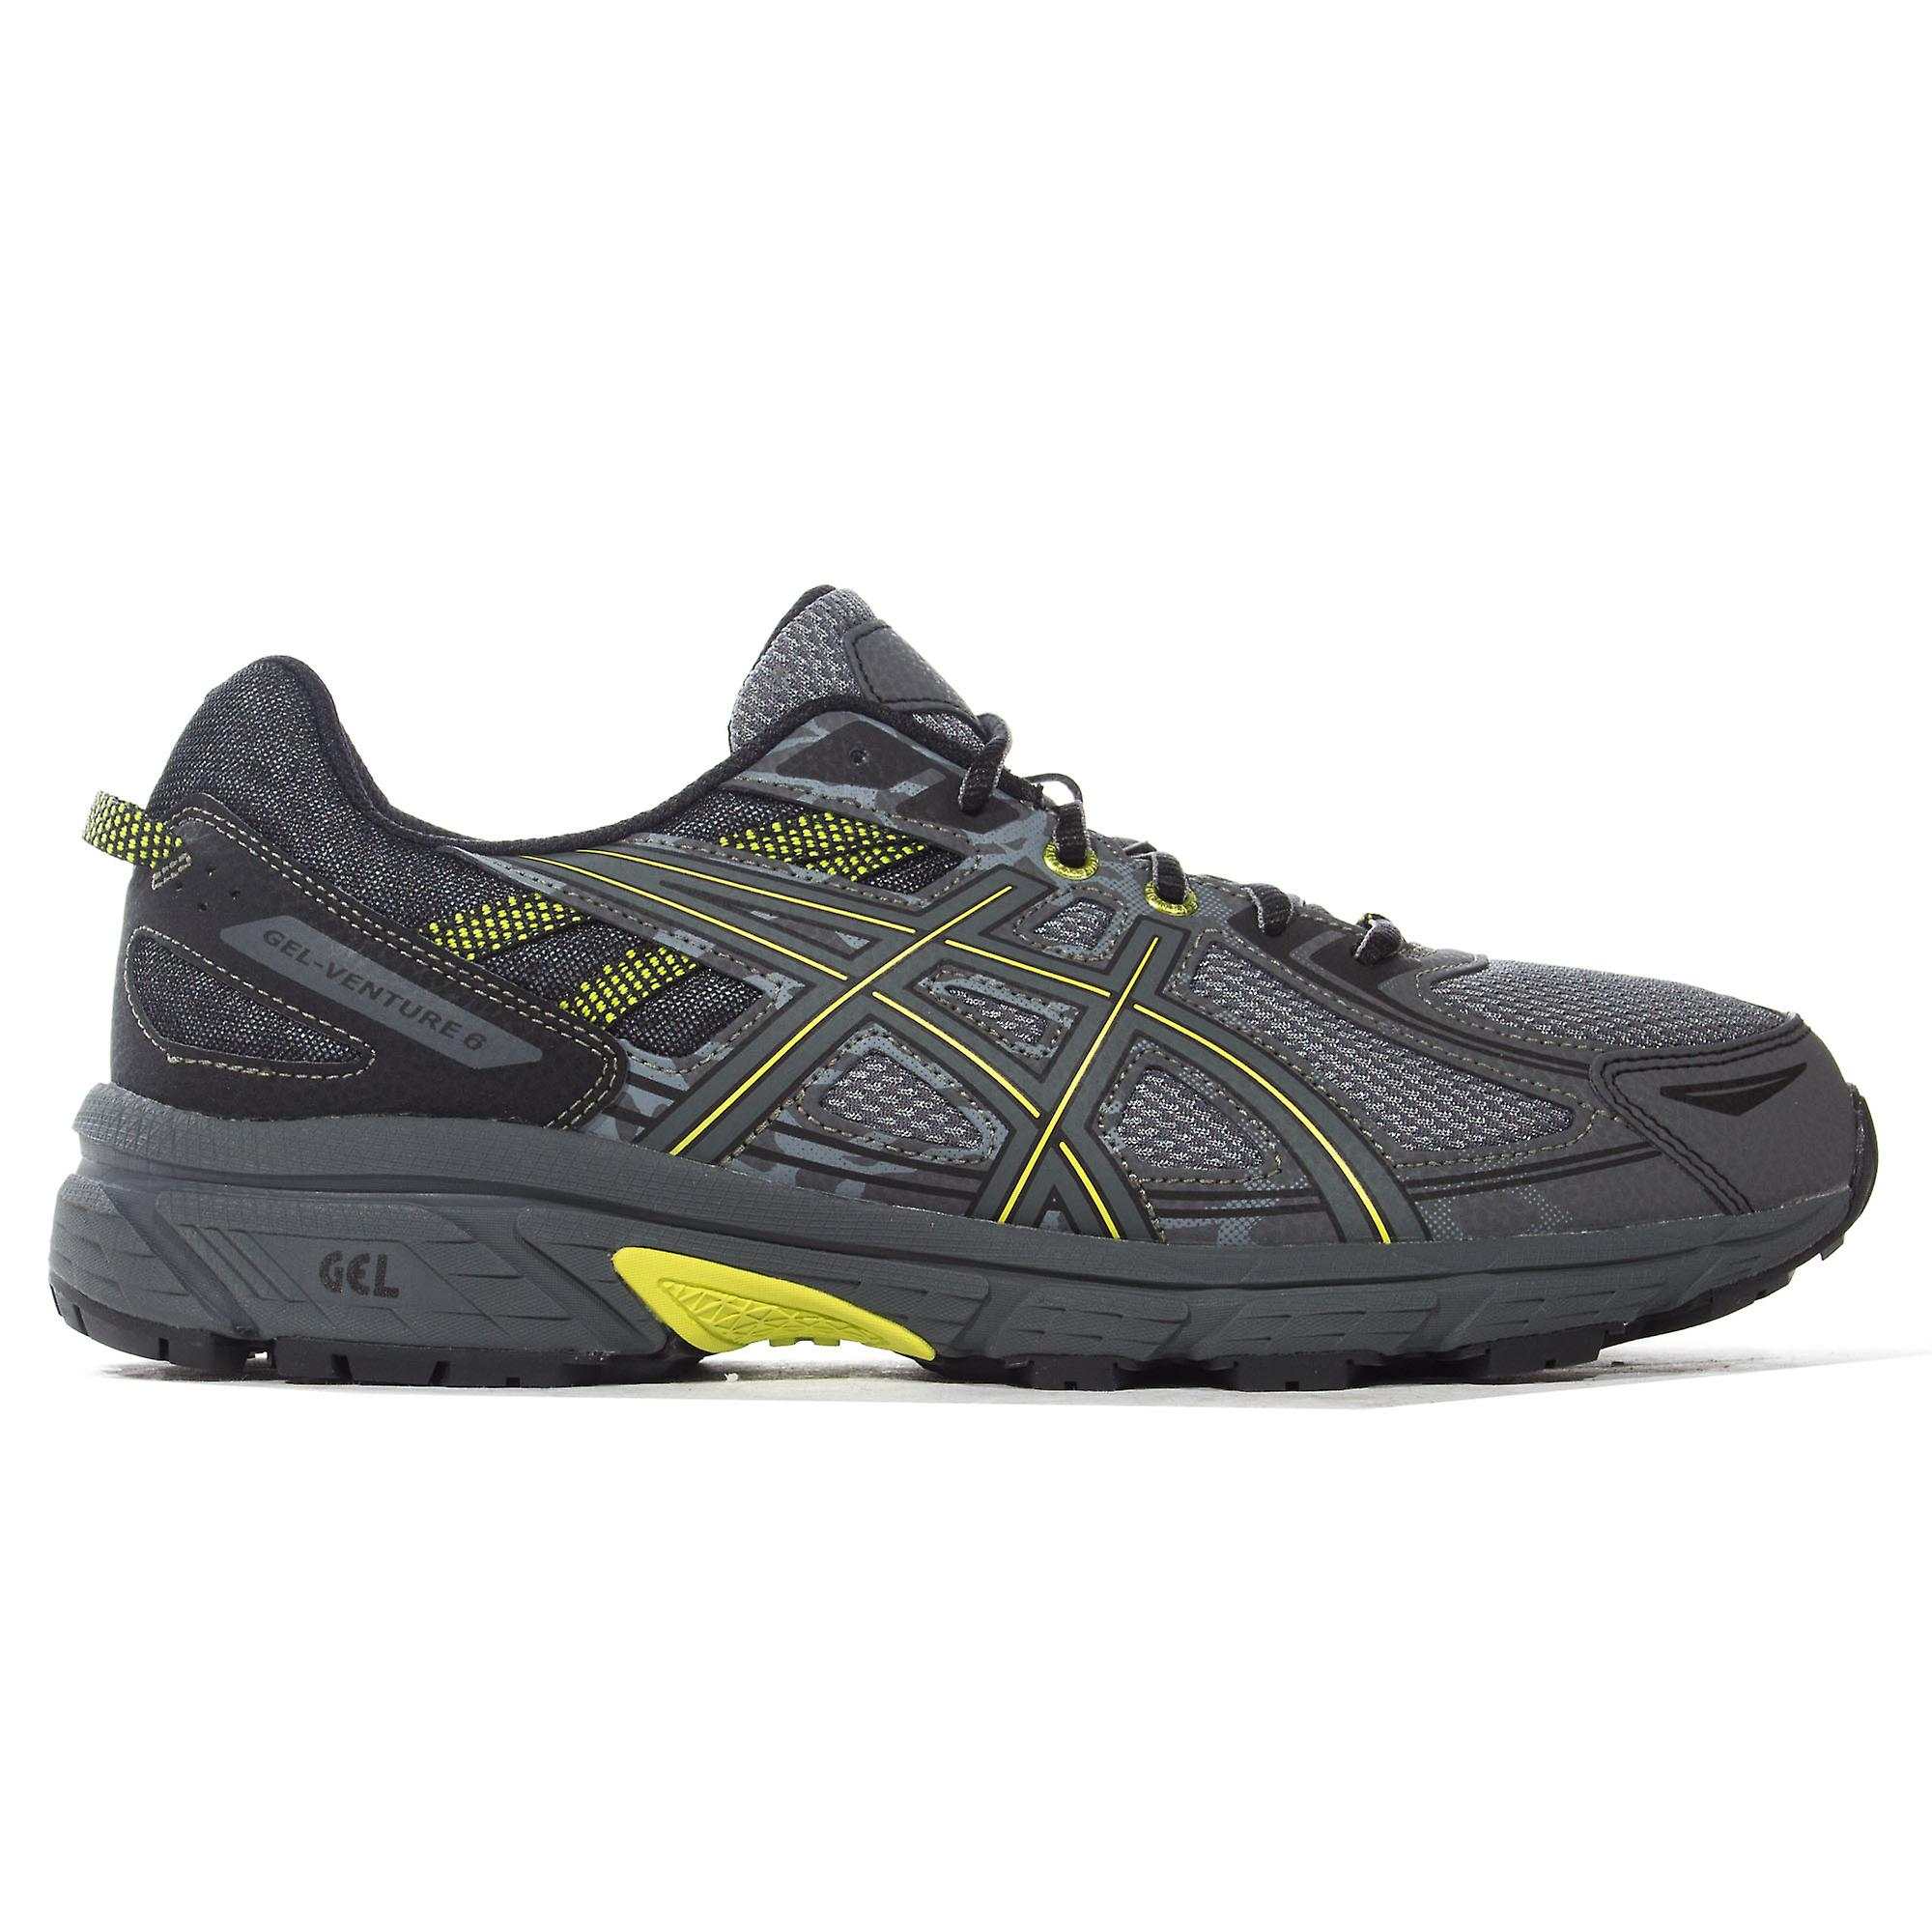 Asics Gel-Venture 6 Mens Trail Running Fitness Trainer Shoe Grey